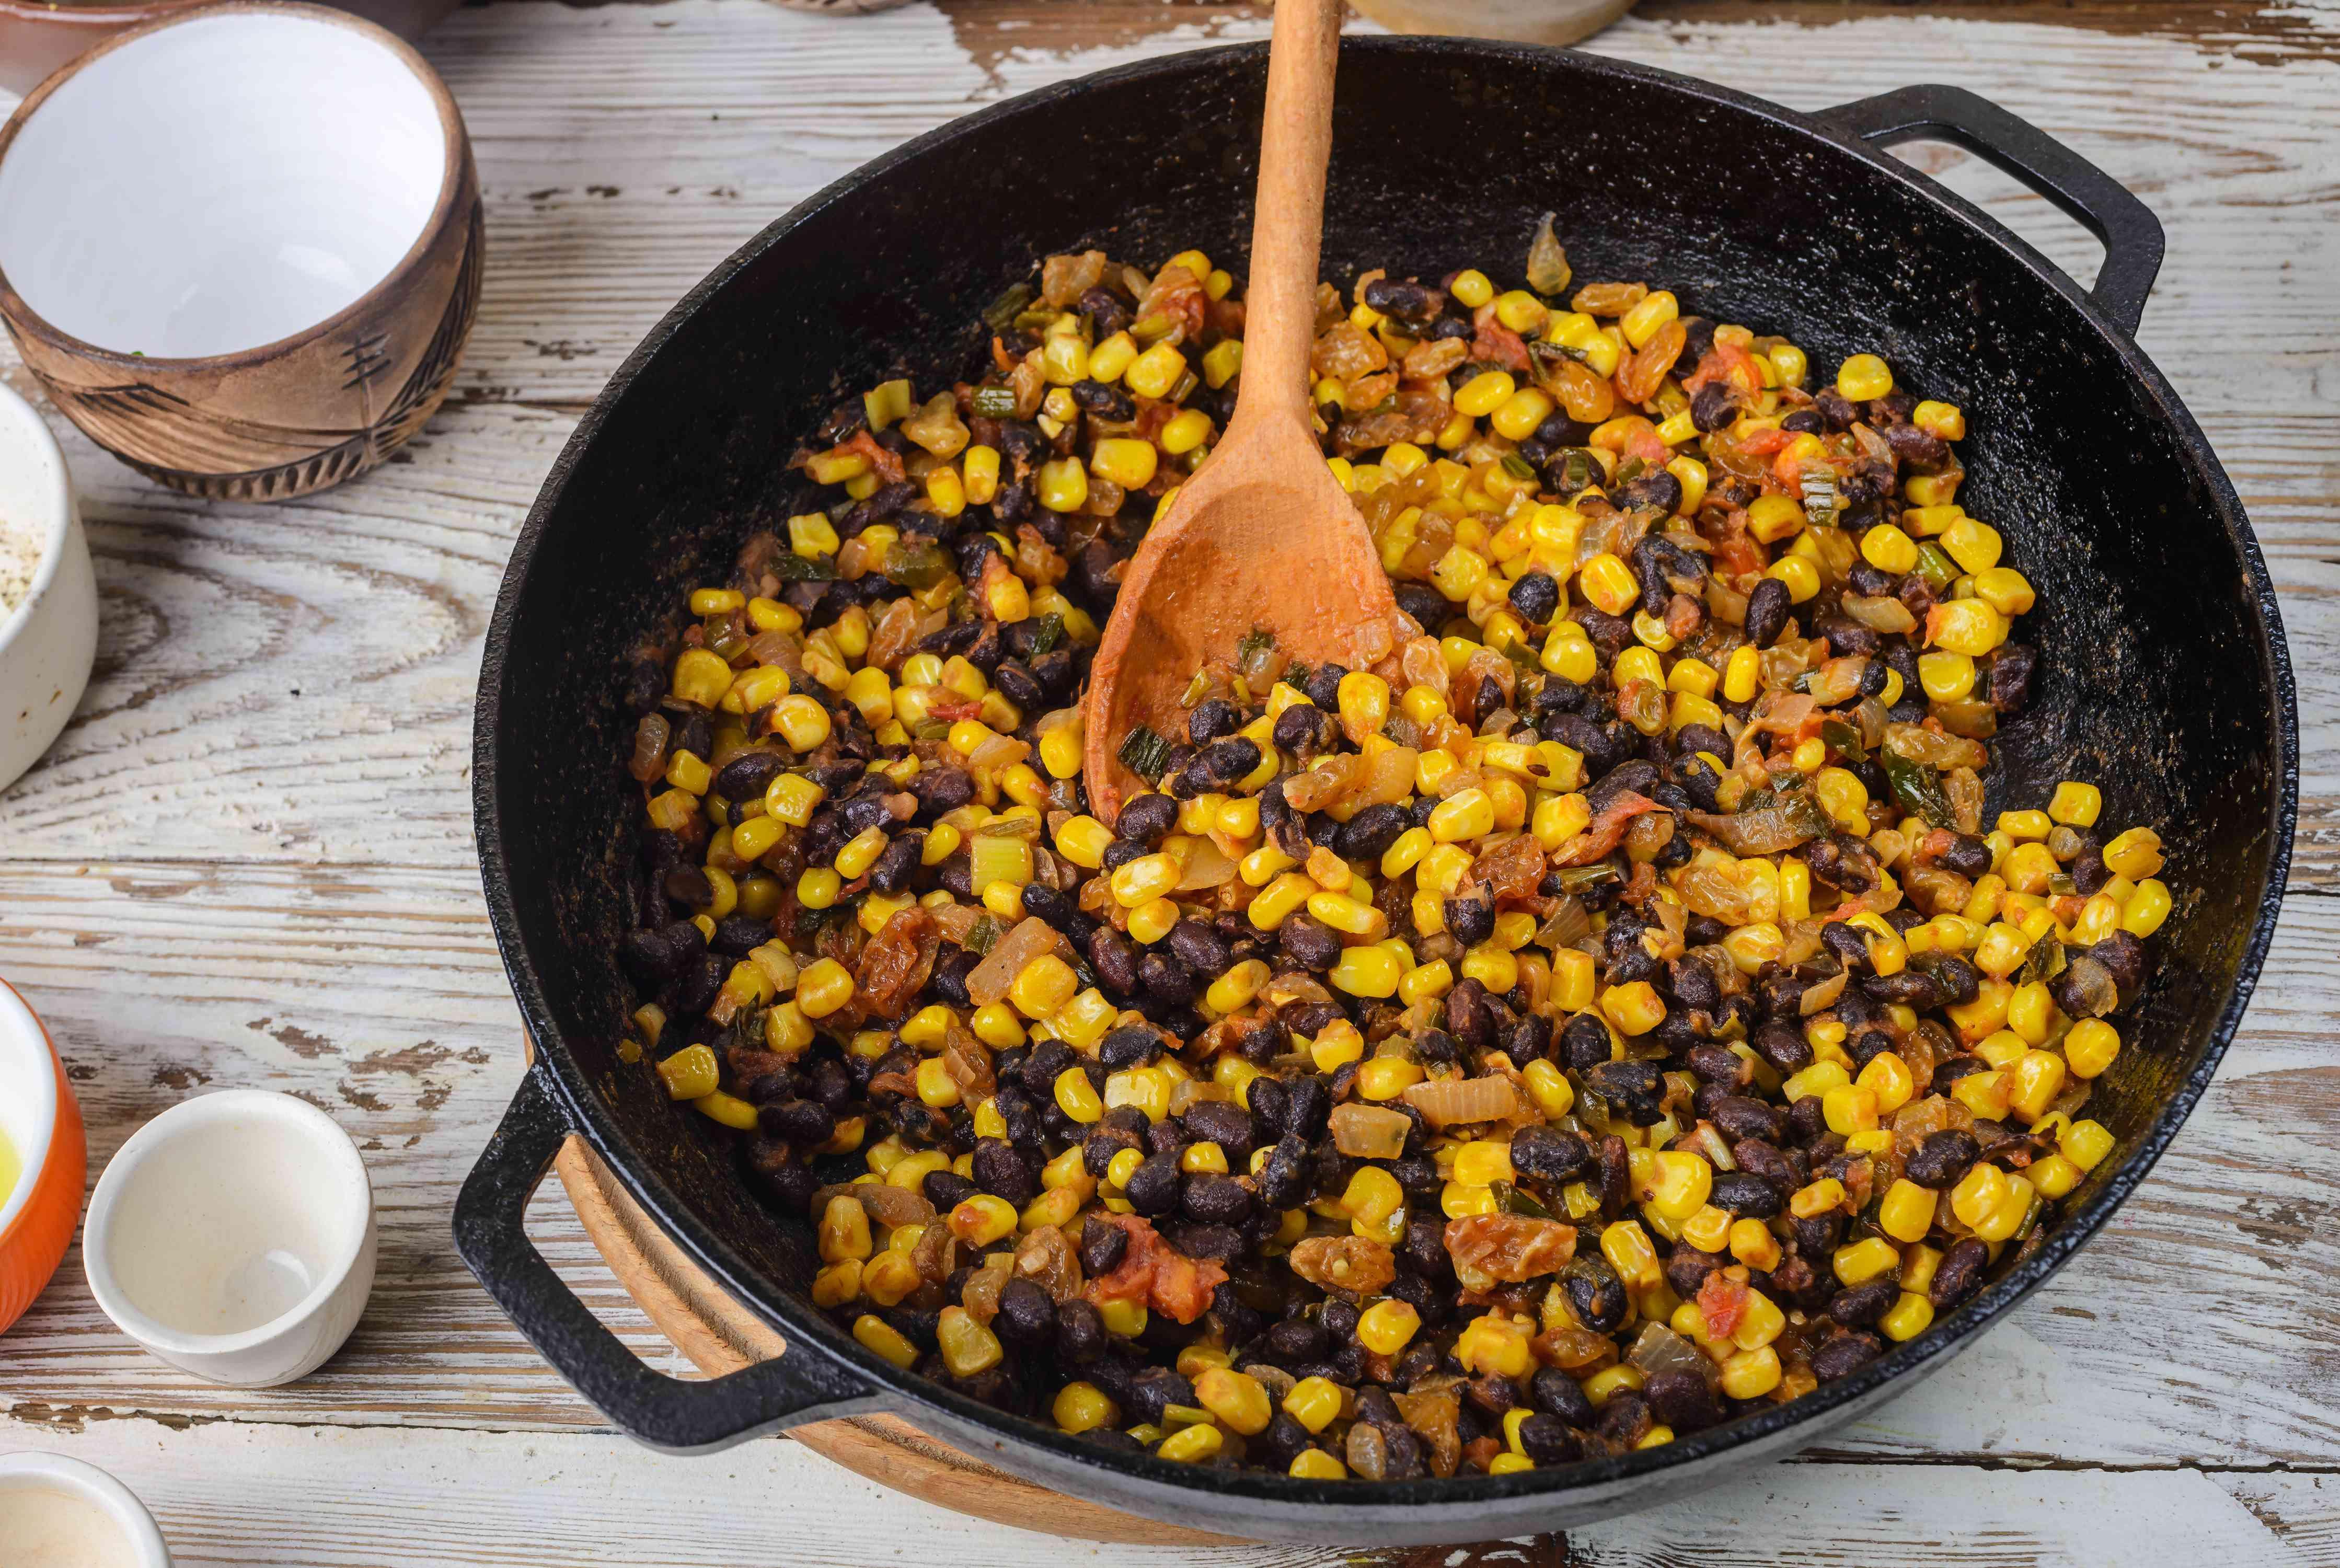 Corn added to pan